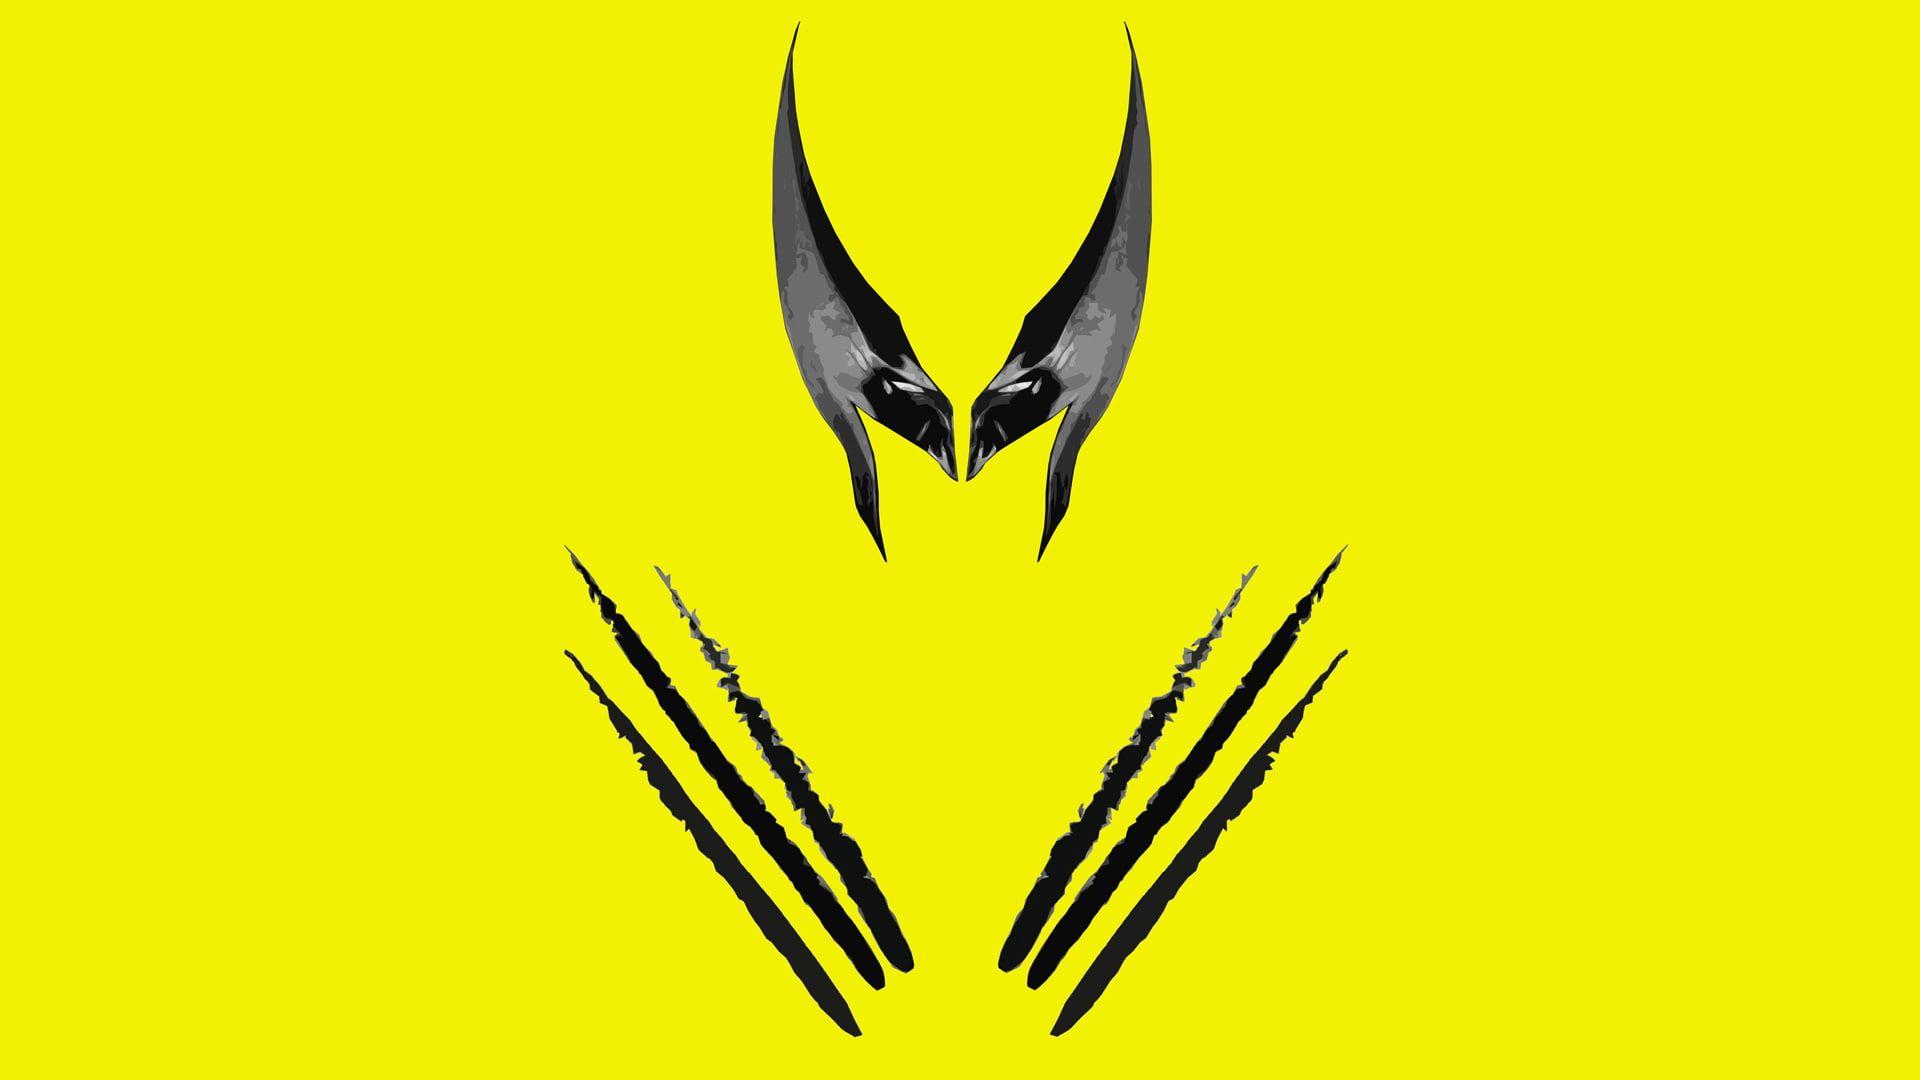 Peliculas X Men Origins Wolverine Peliculas X Men Wolverine Fondo De Pantalla Wolverine Wallpaper X Men Wolverine Movie